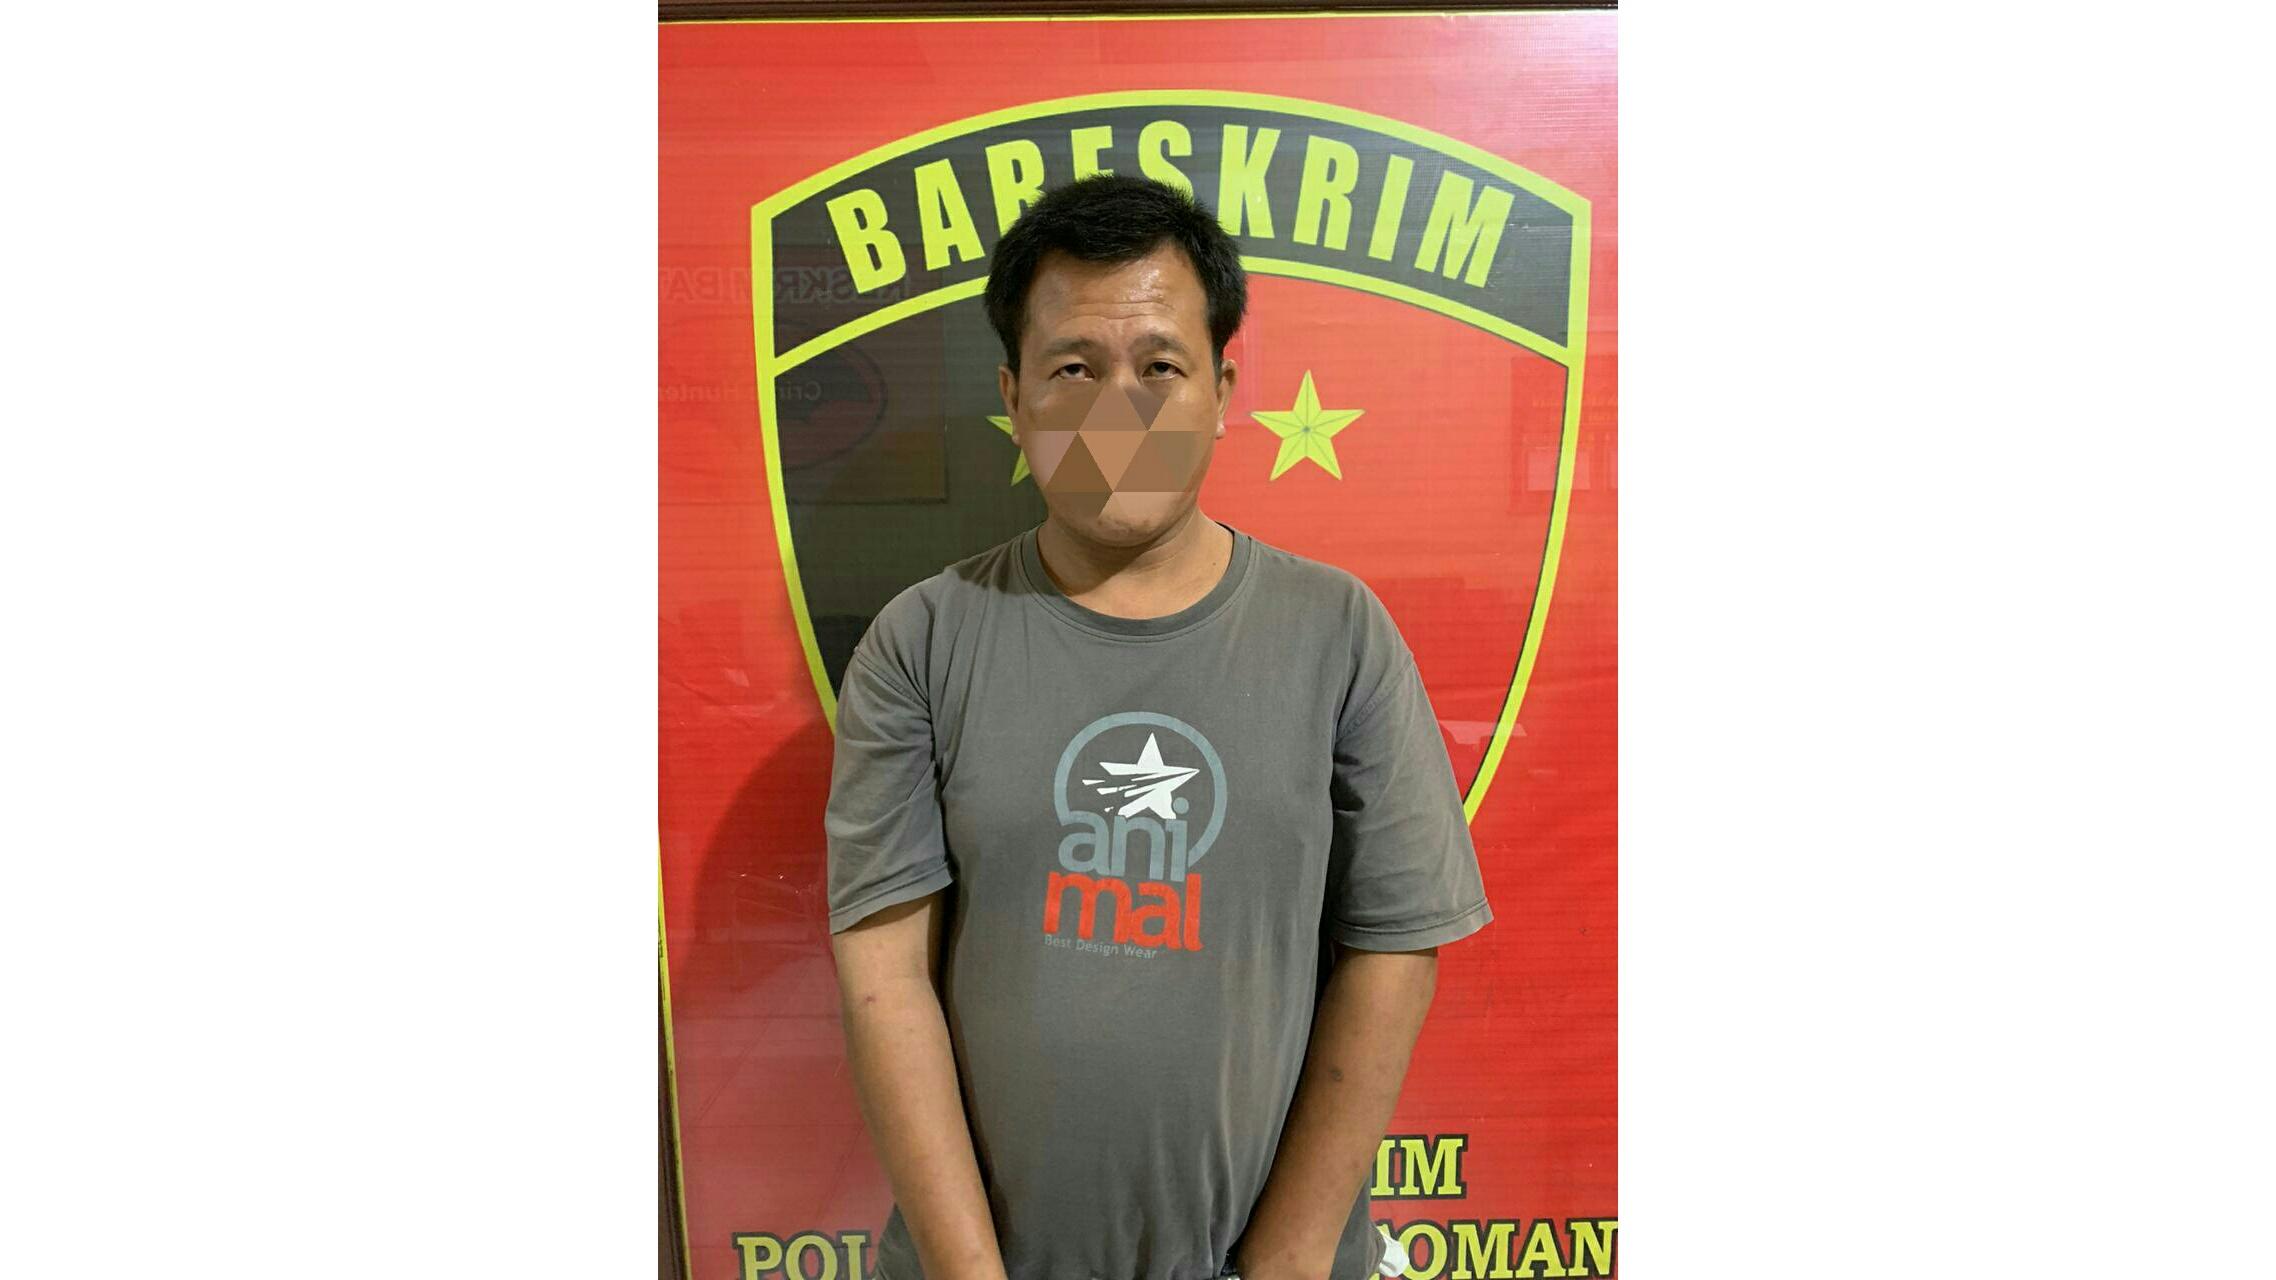 mantan-residivis-kembali-berulah-tertangkap-kasus-yang-sama-narkoba-muba378791599621705.jpg